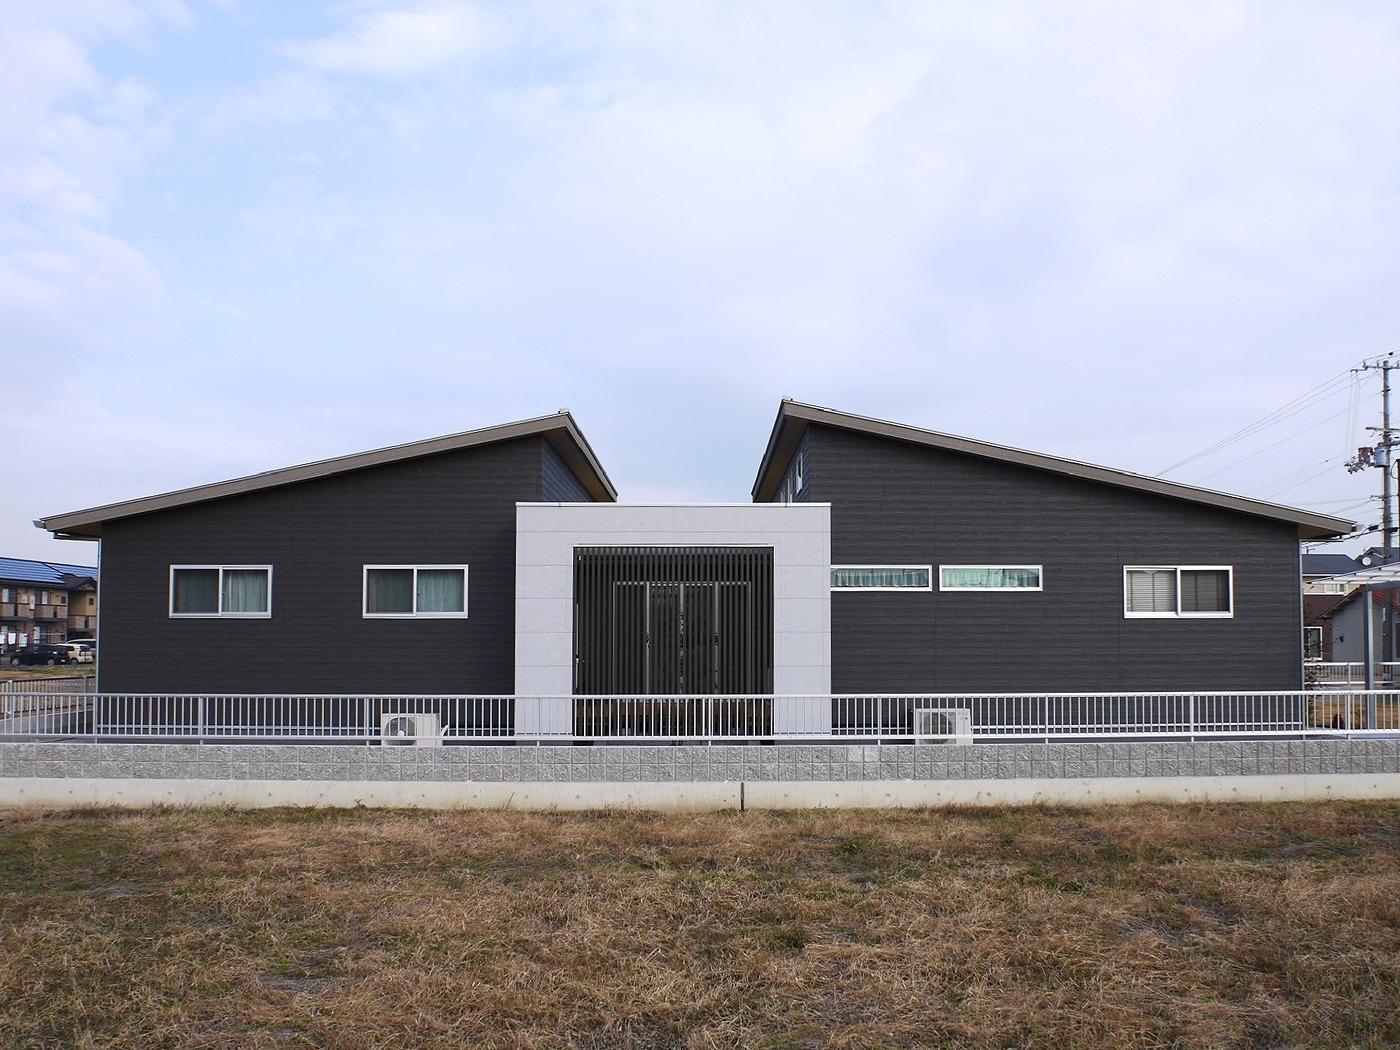 高松市の新築注文住宅の外観